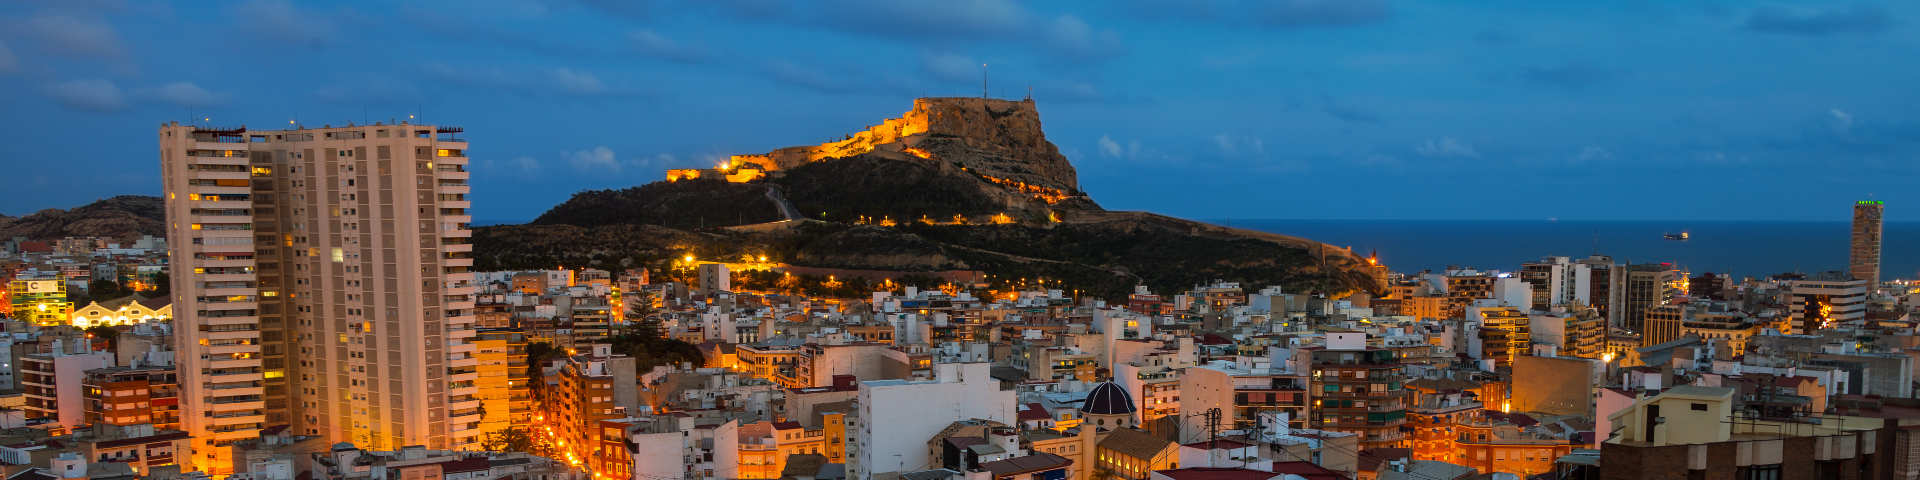 Alicante hero2